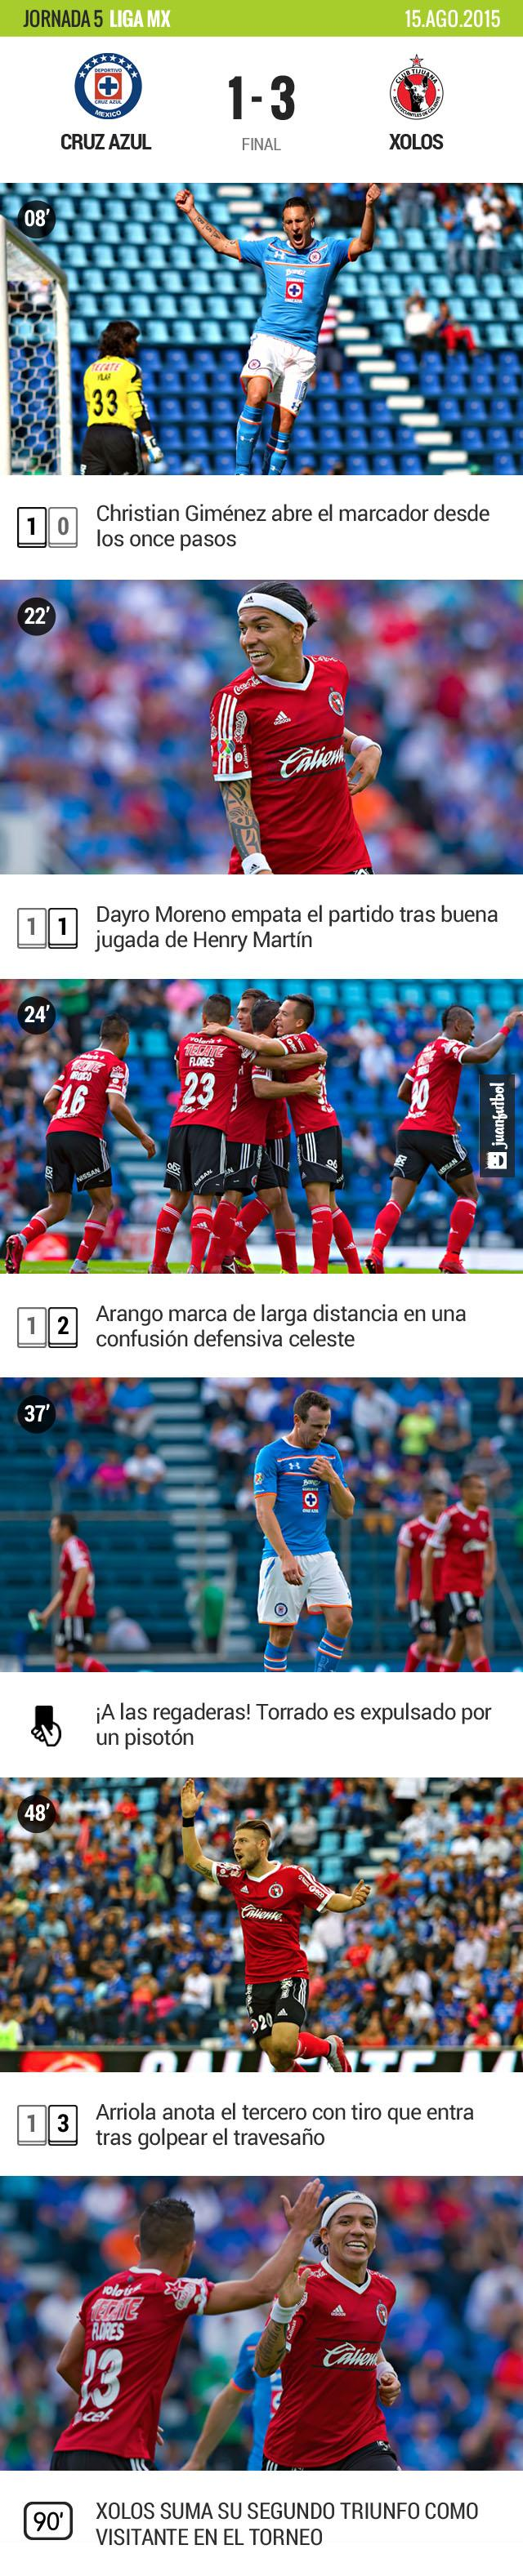 Tijuana dio cuenta de Cruz Azul en la capital